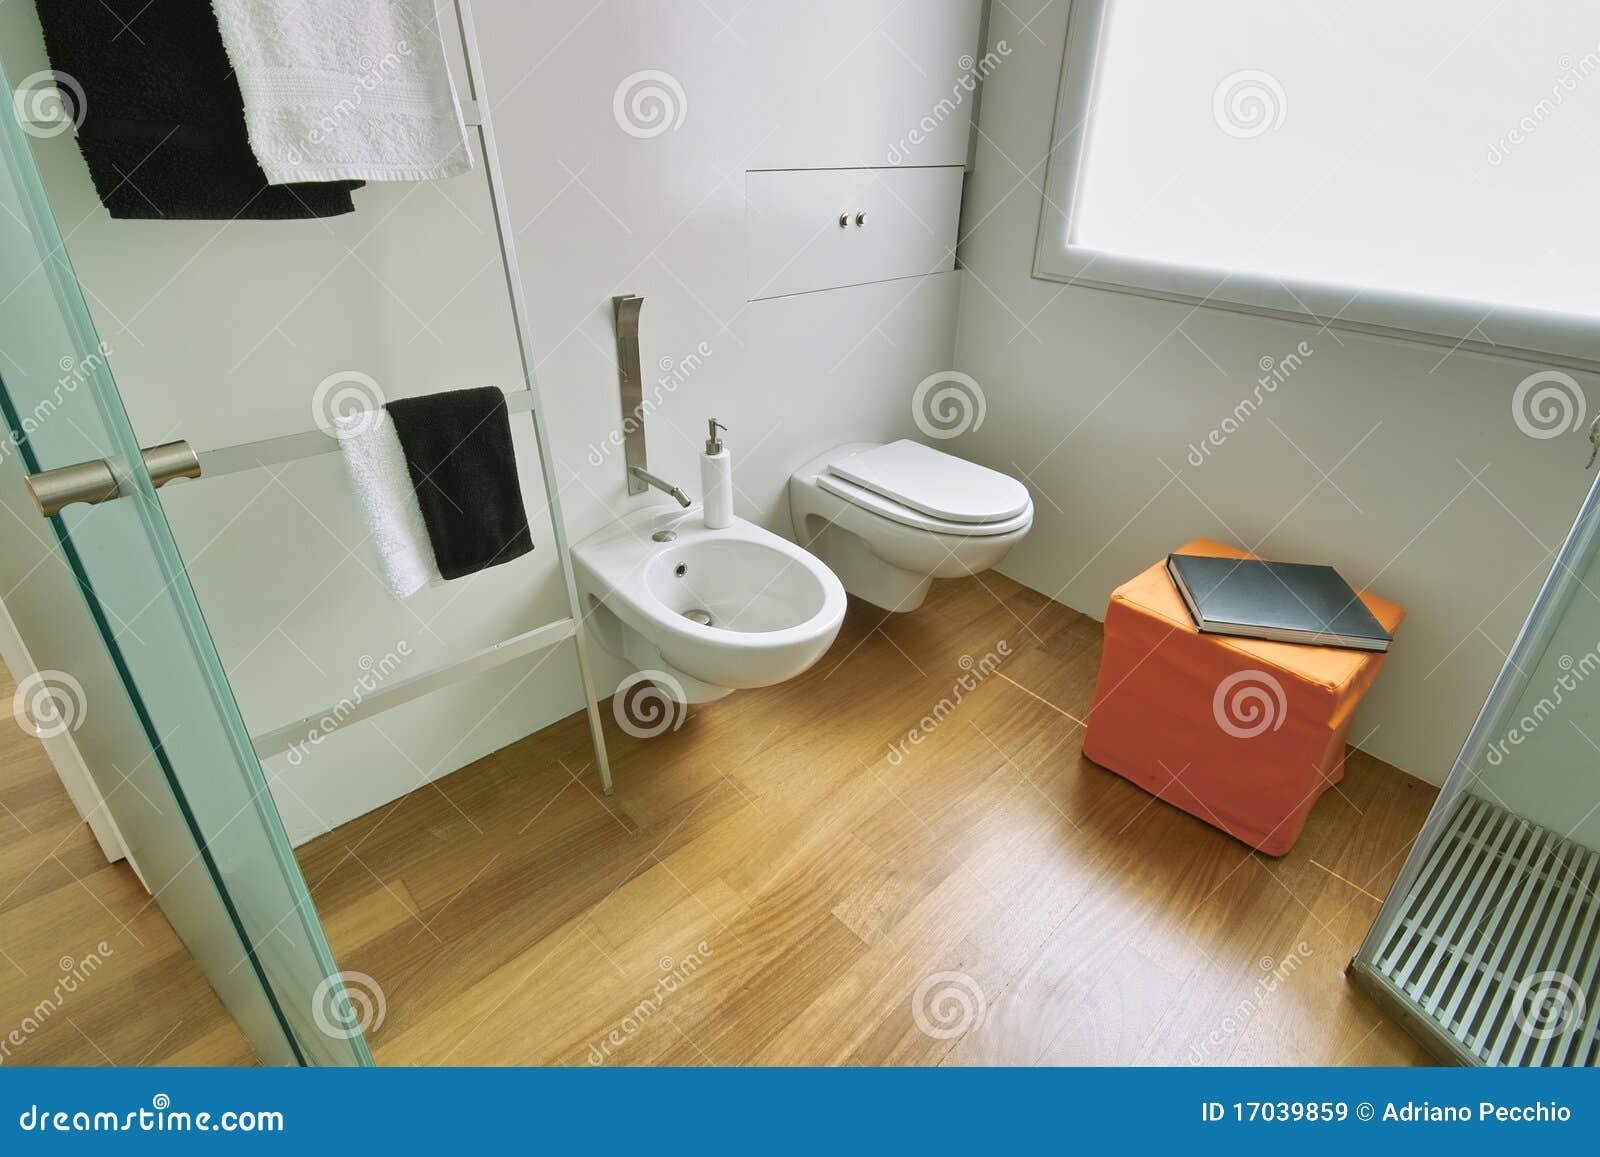 modernes kleines badezimmer lizenzfreie stockbilder bild. Black Bedroom Furniture Sets. Home Design Ideas